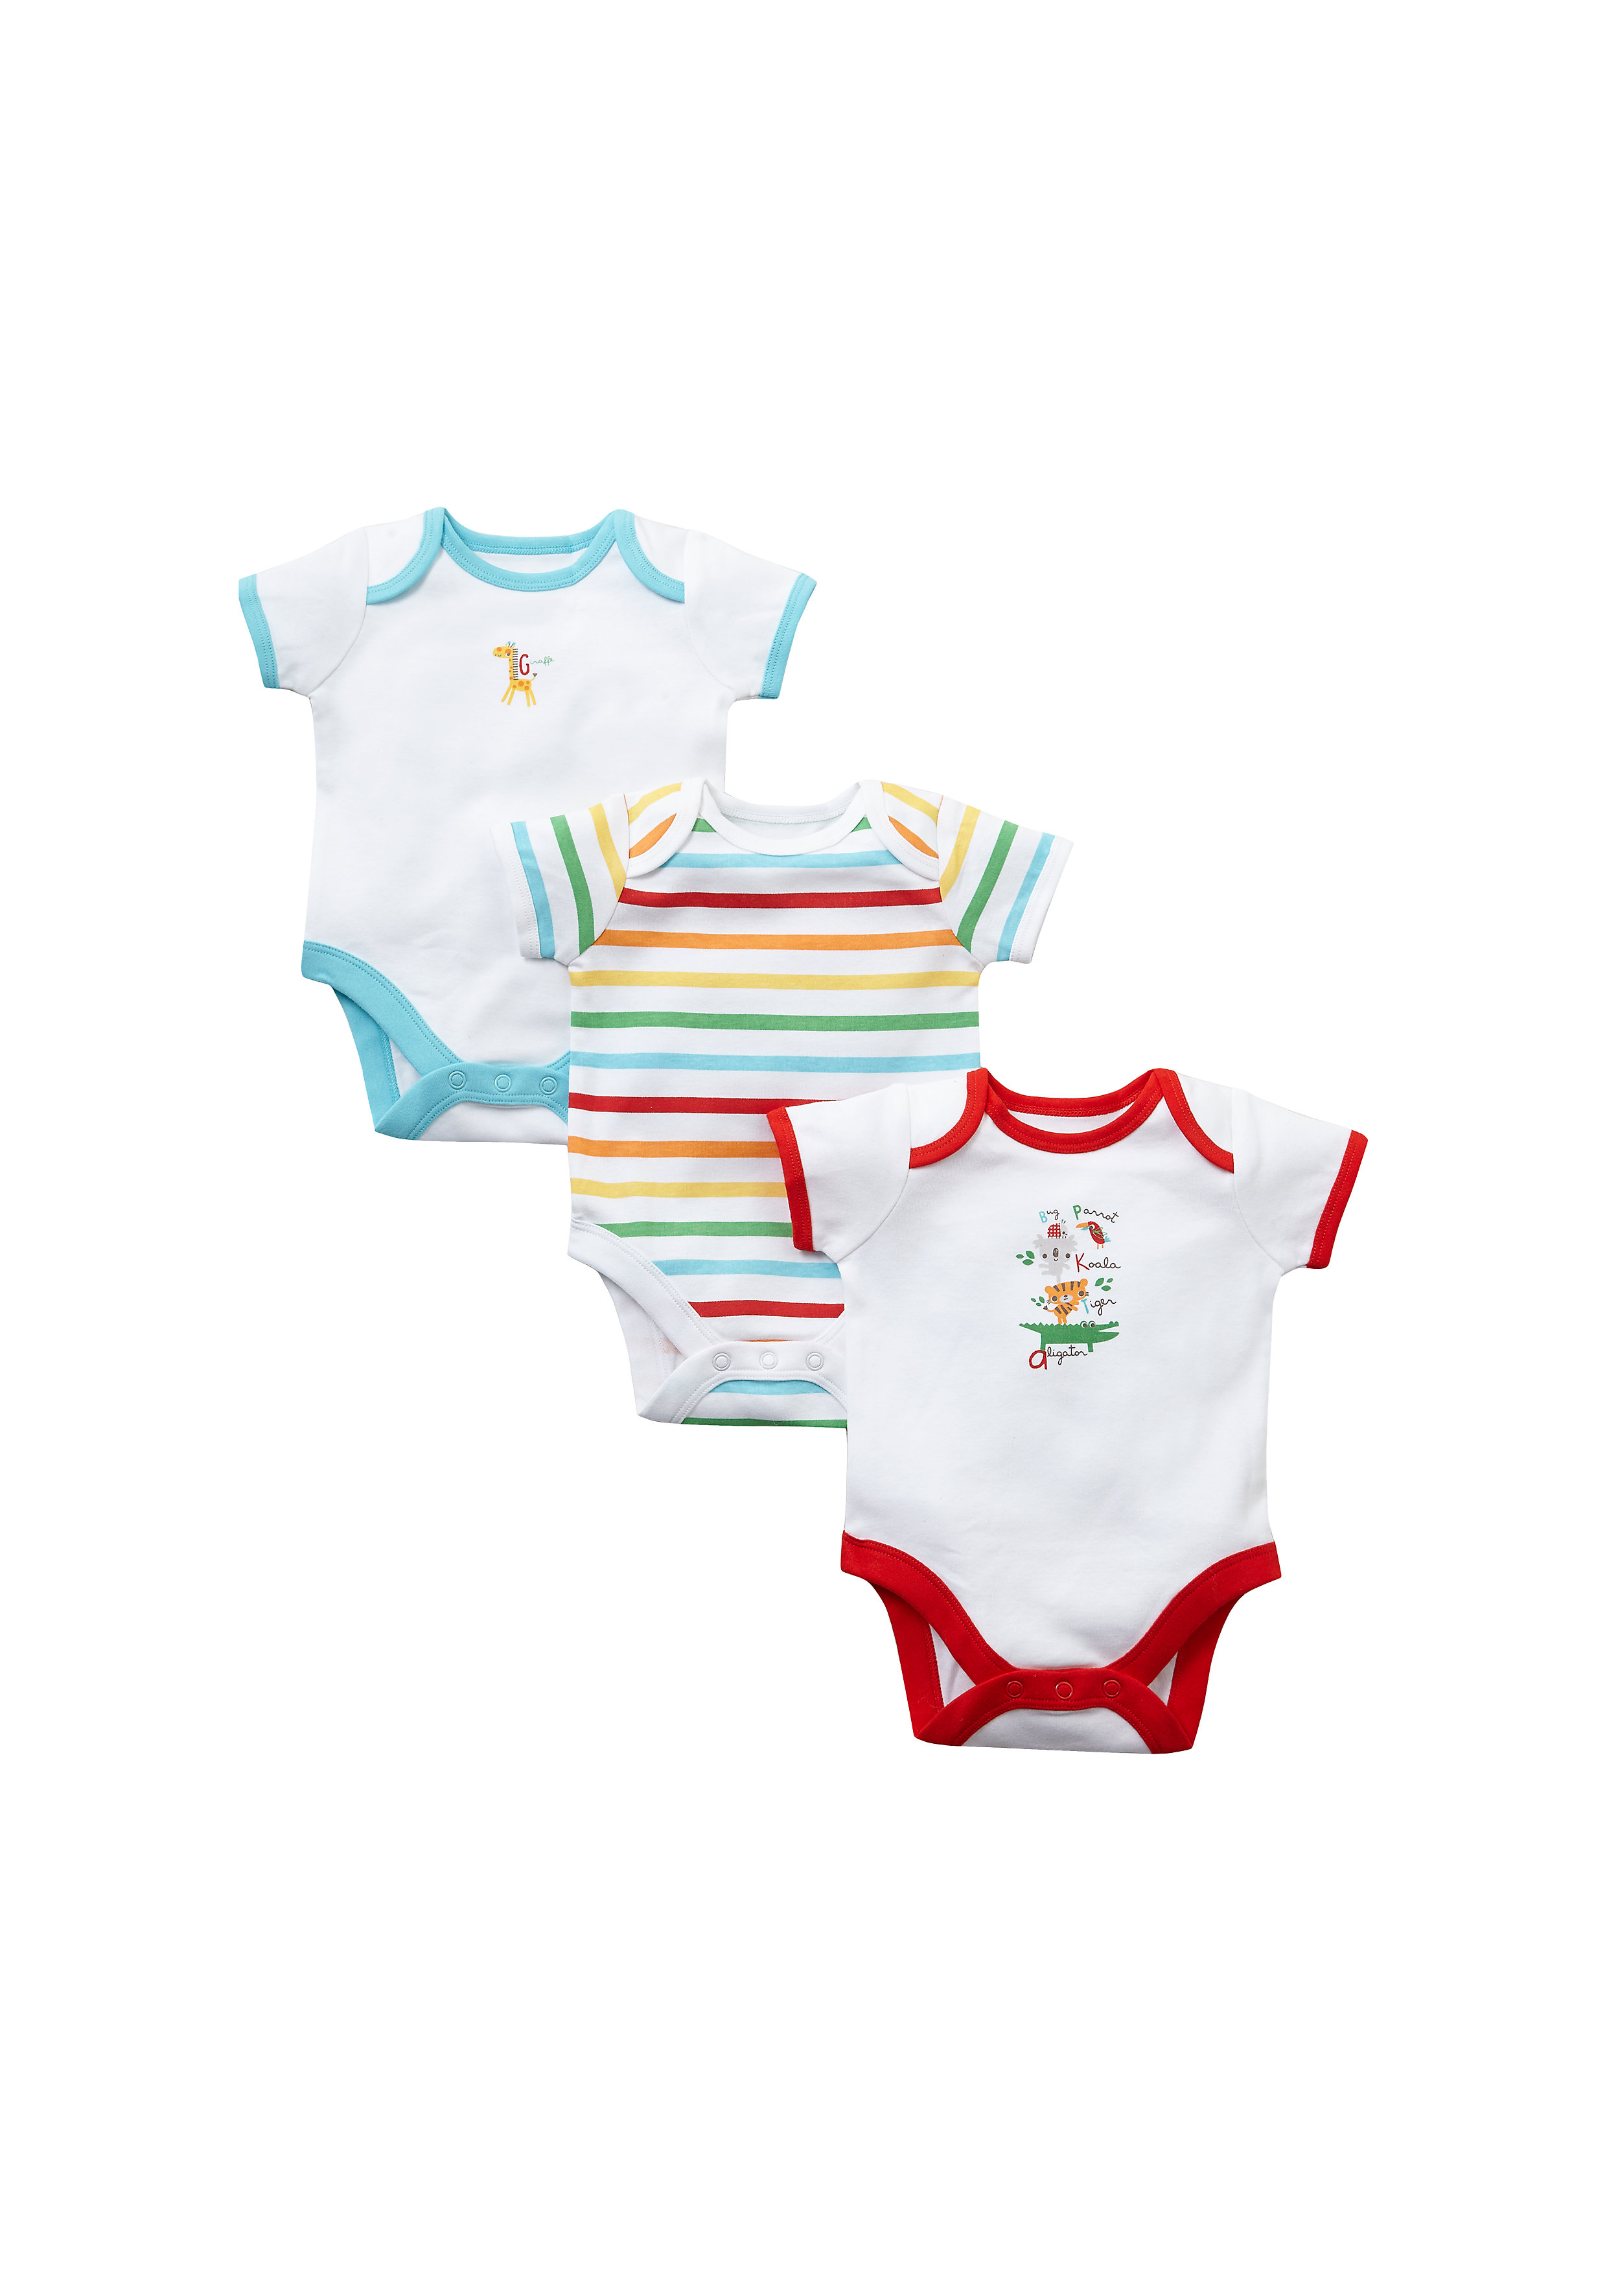 Mothercare | White Unisex Unisex Short Sleeve Bodysuits - Pack Of 3